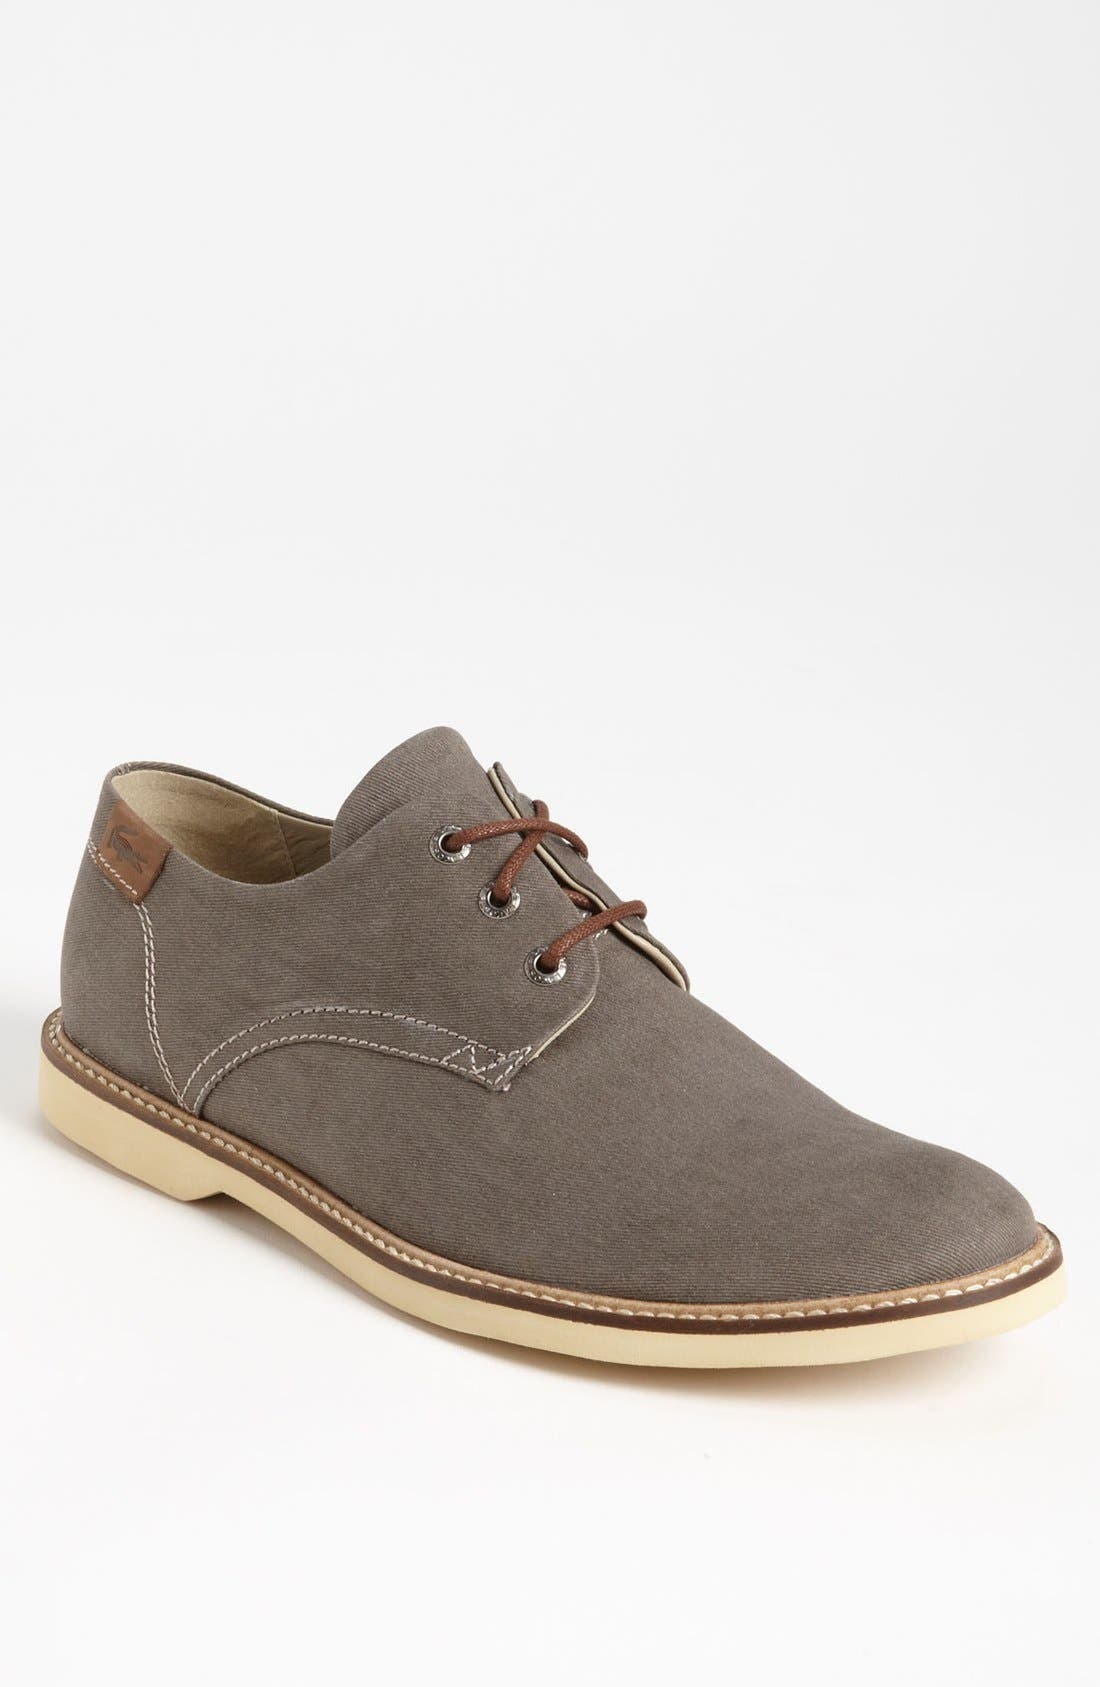 Alternate Image 1 Selected - Lacoste 'Sherbrooke 7' Twill Buck Shoe